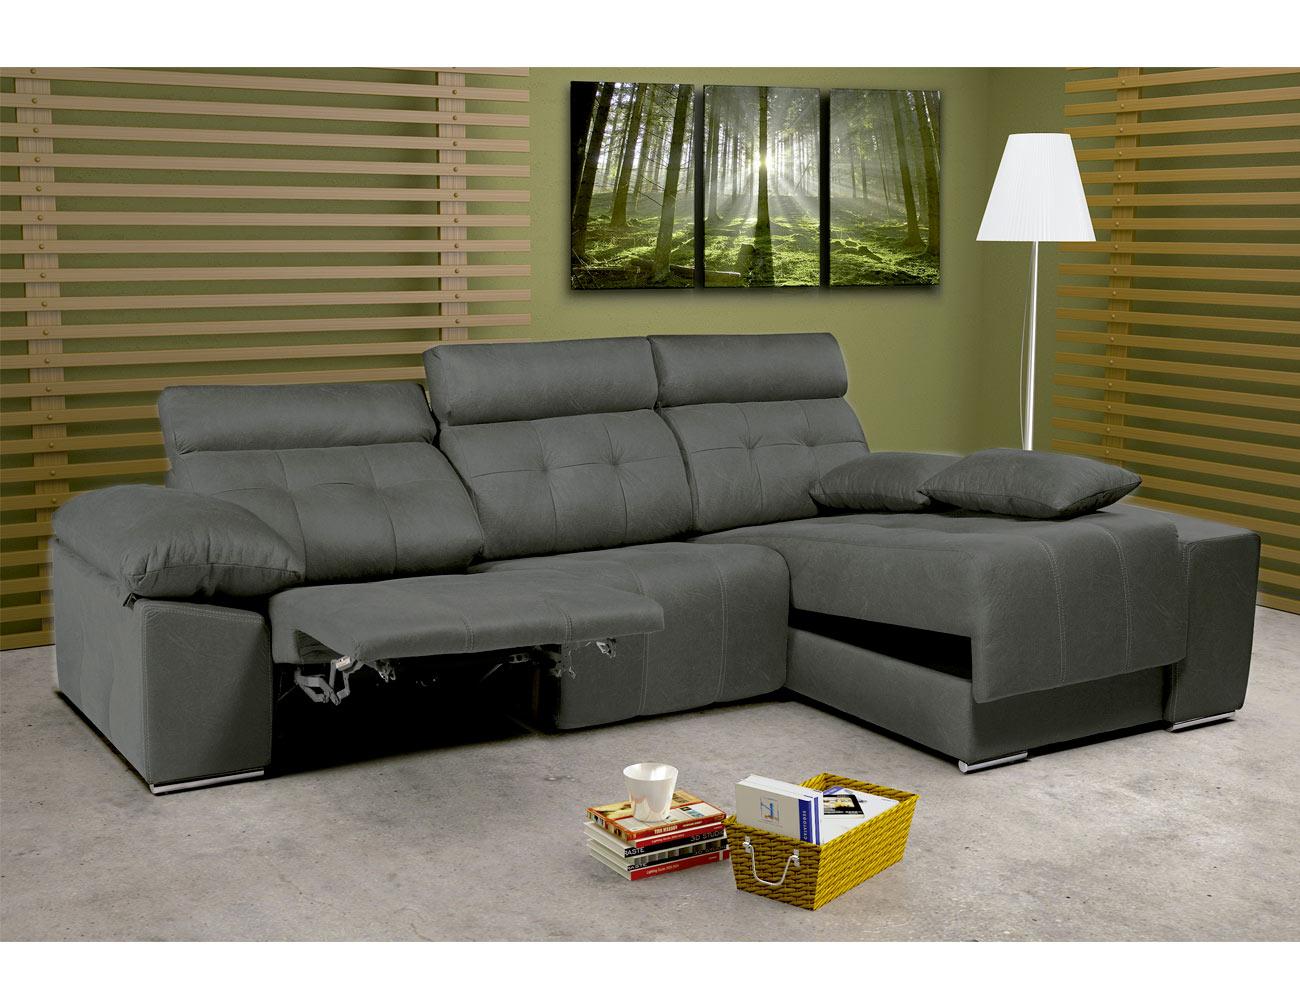 Sof de gran calidad en tejido jarama 19769 factory - Factory del sofa sevilla ...